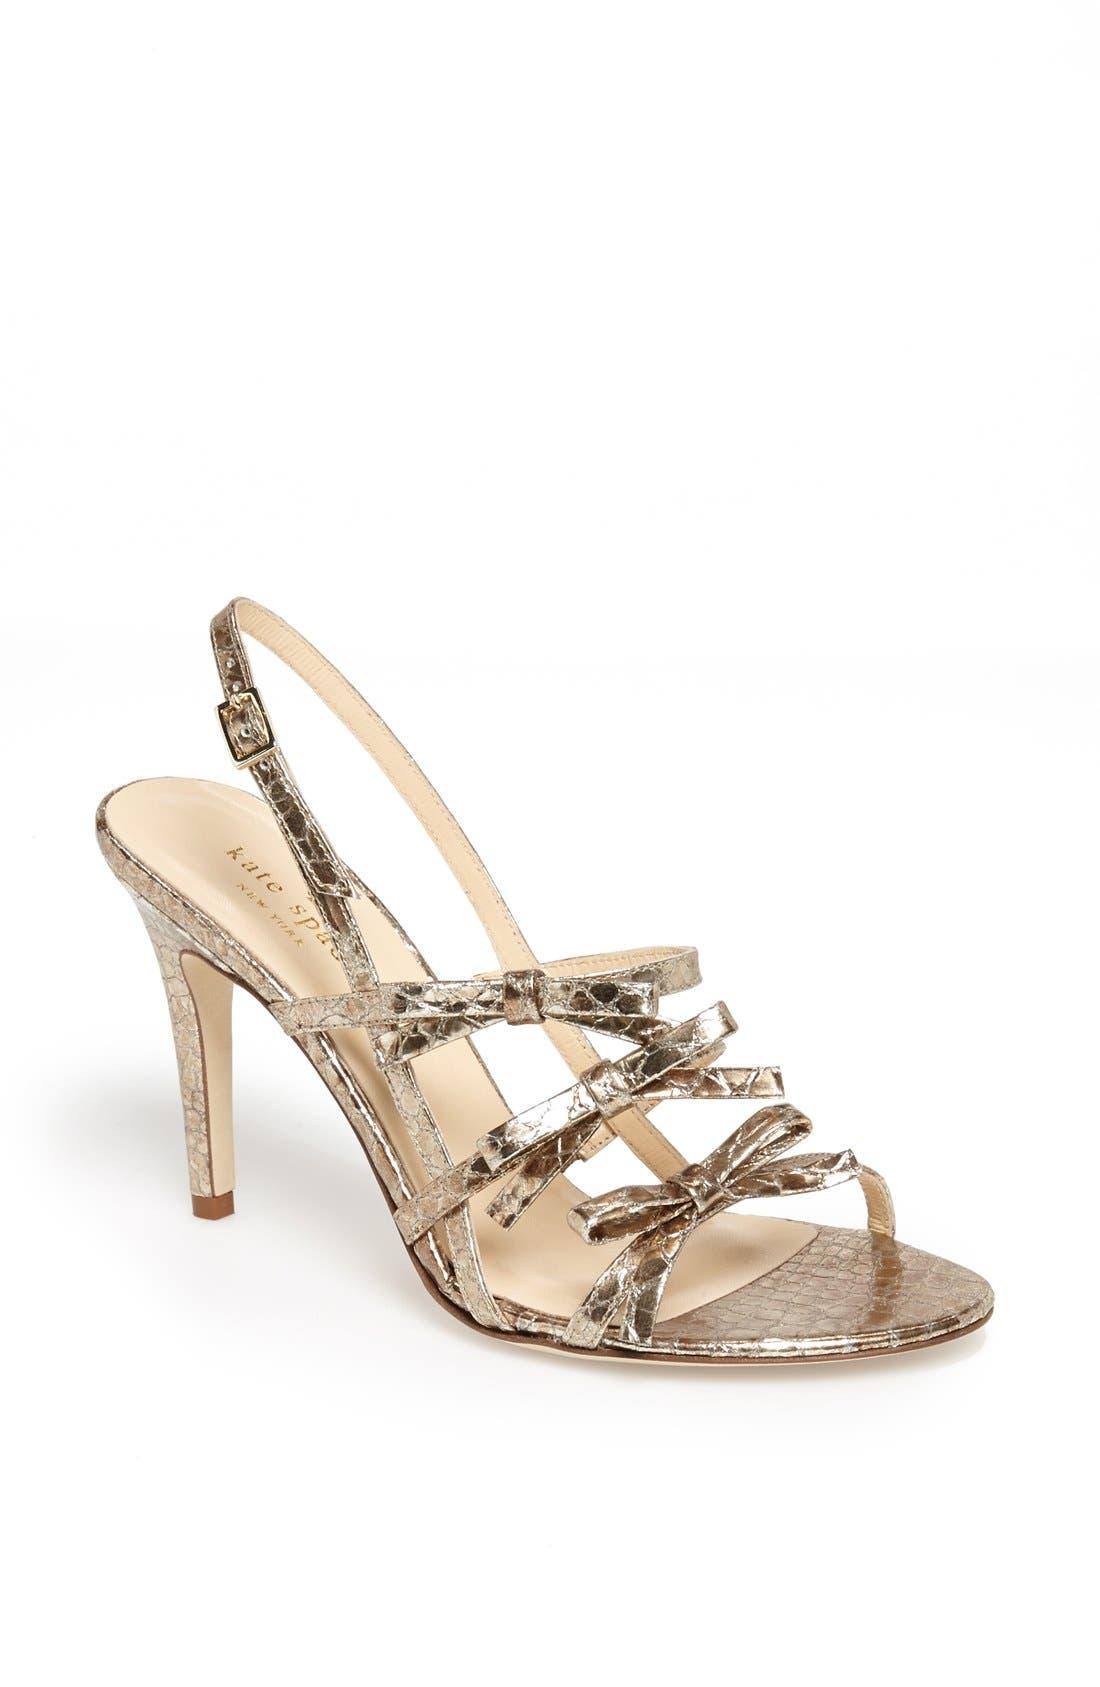 Main Image - kate spade new york 'sally' sandal (Women)